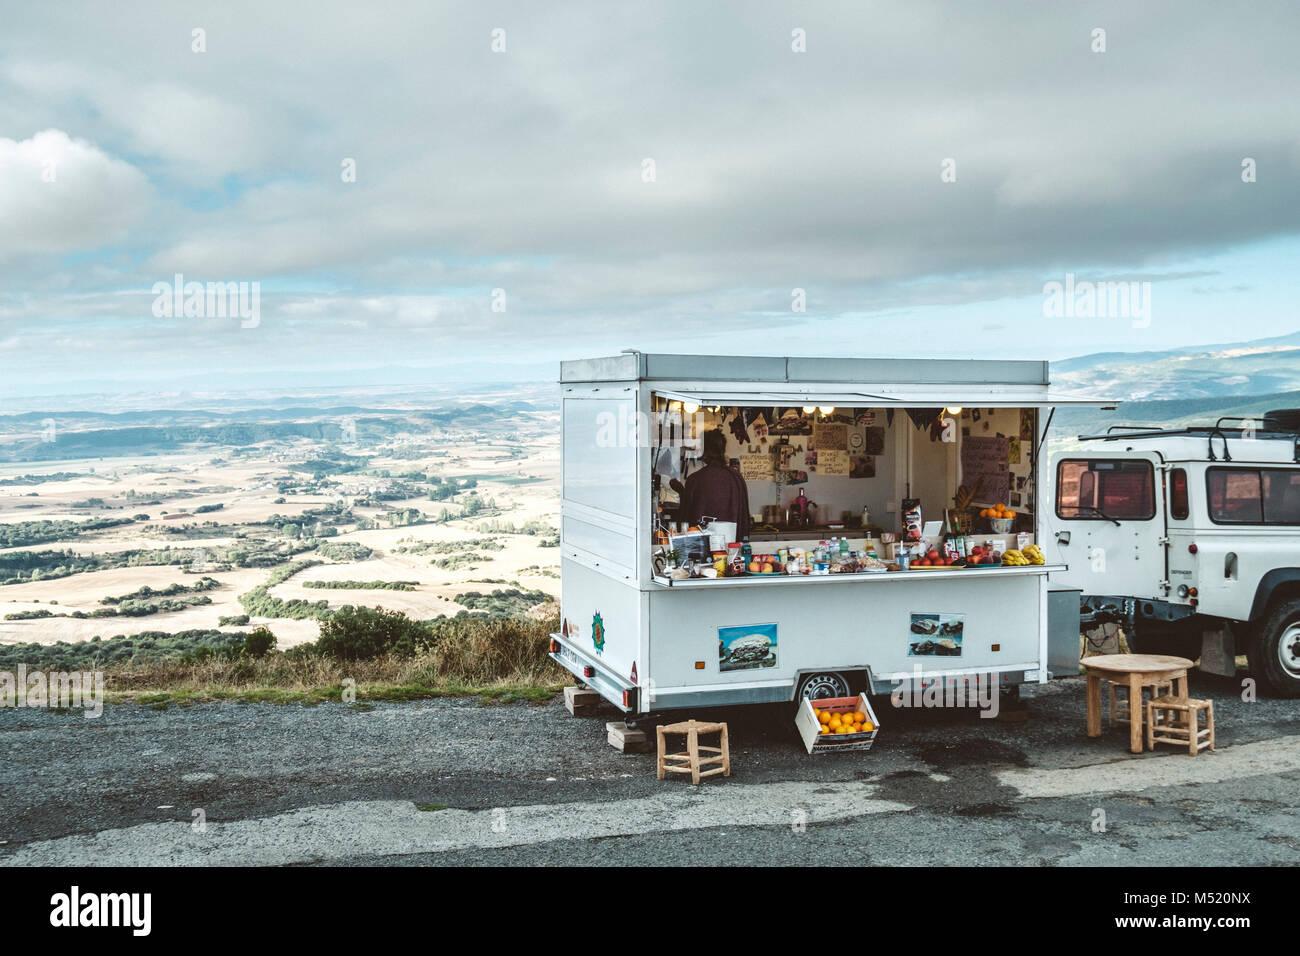 Food truck parked on roadside, Pamplona, Navarre, Spain Stock Photo